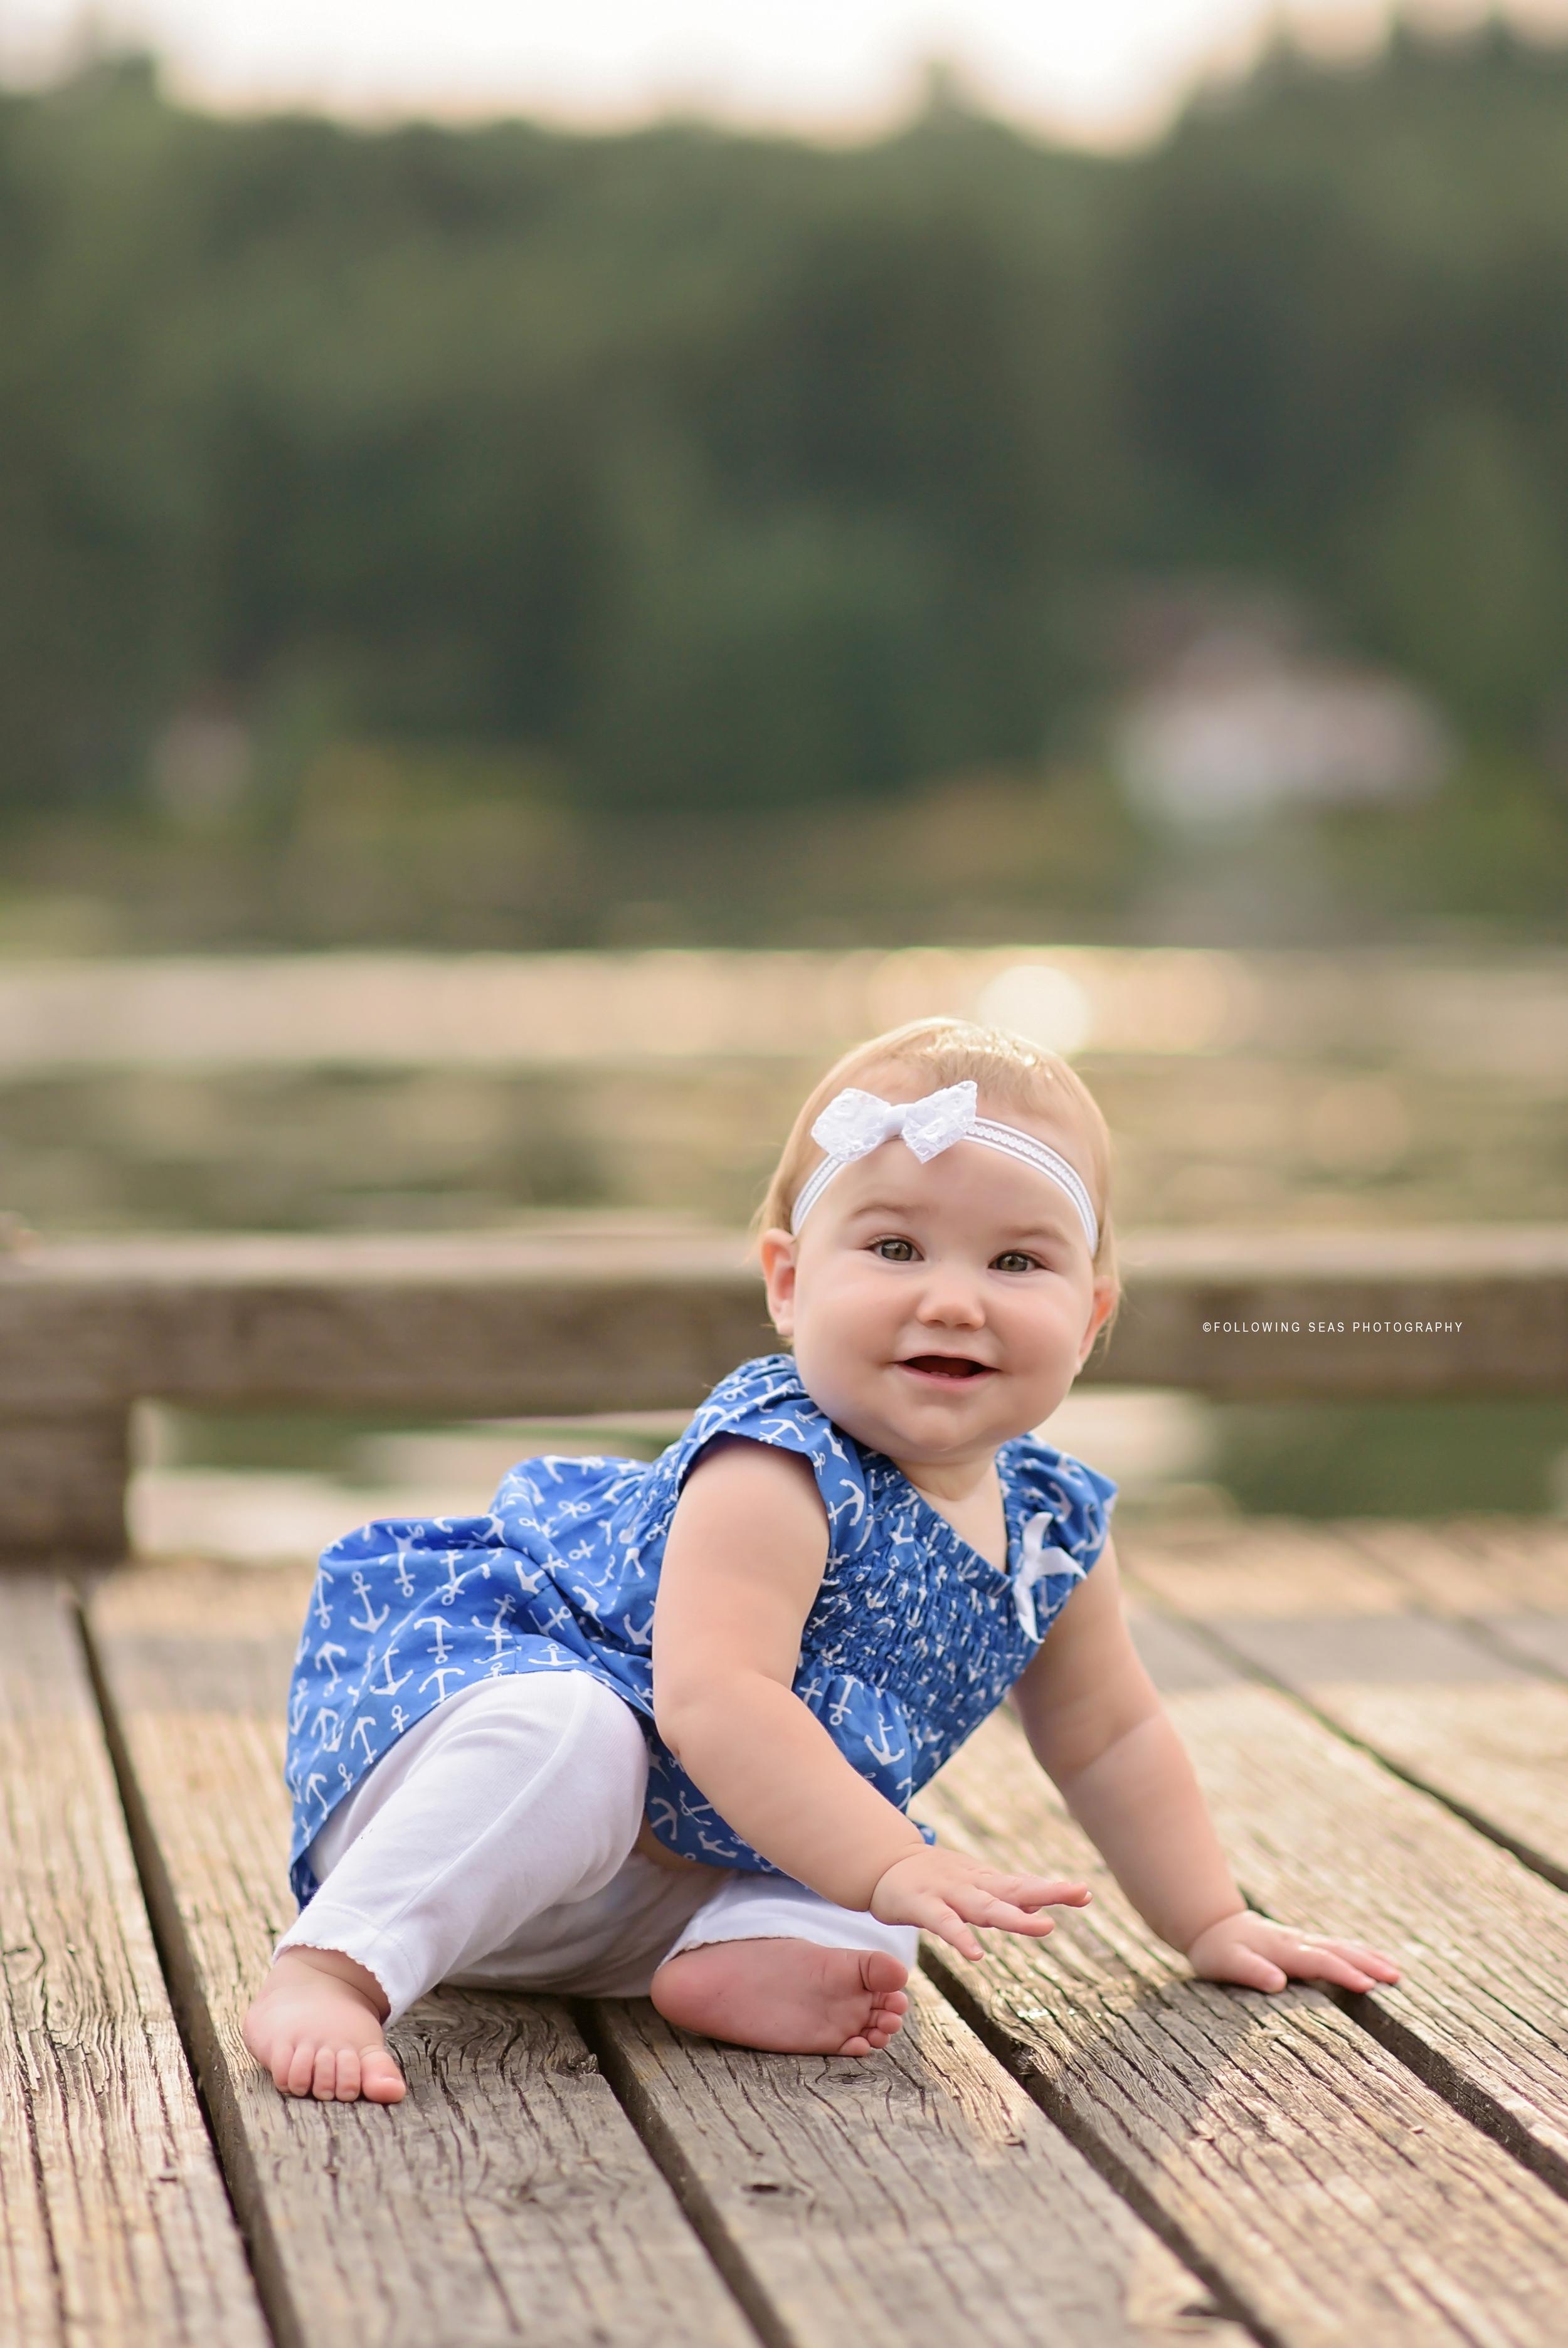 Bremerton-Family-Photographer-Following-Seas-Photography-0633 copy.jpg